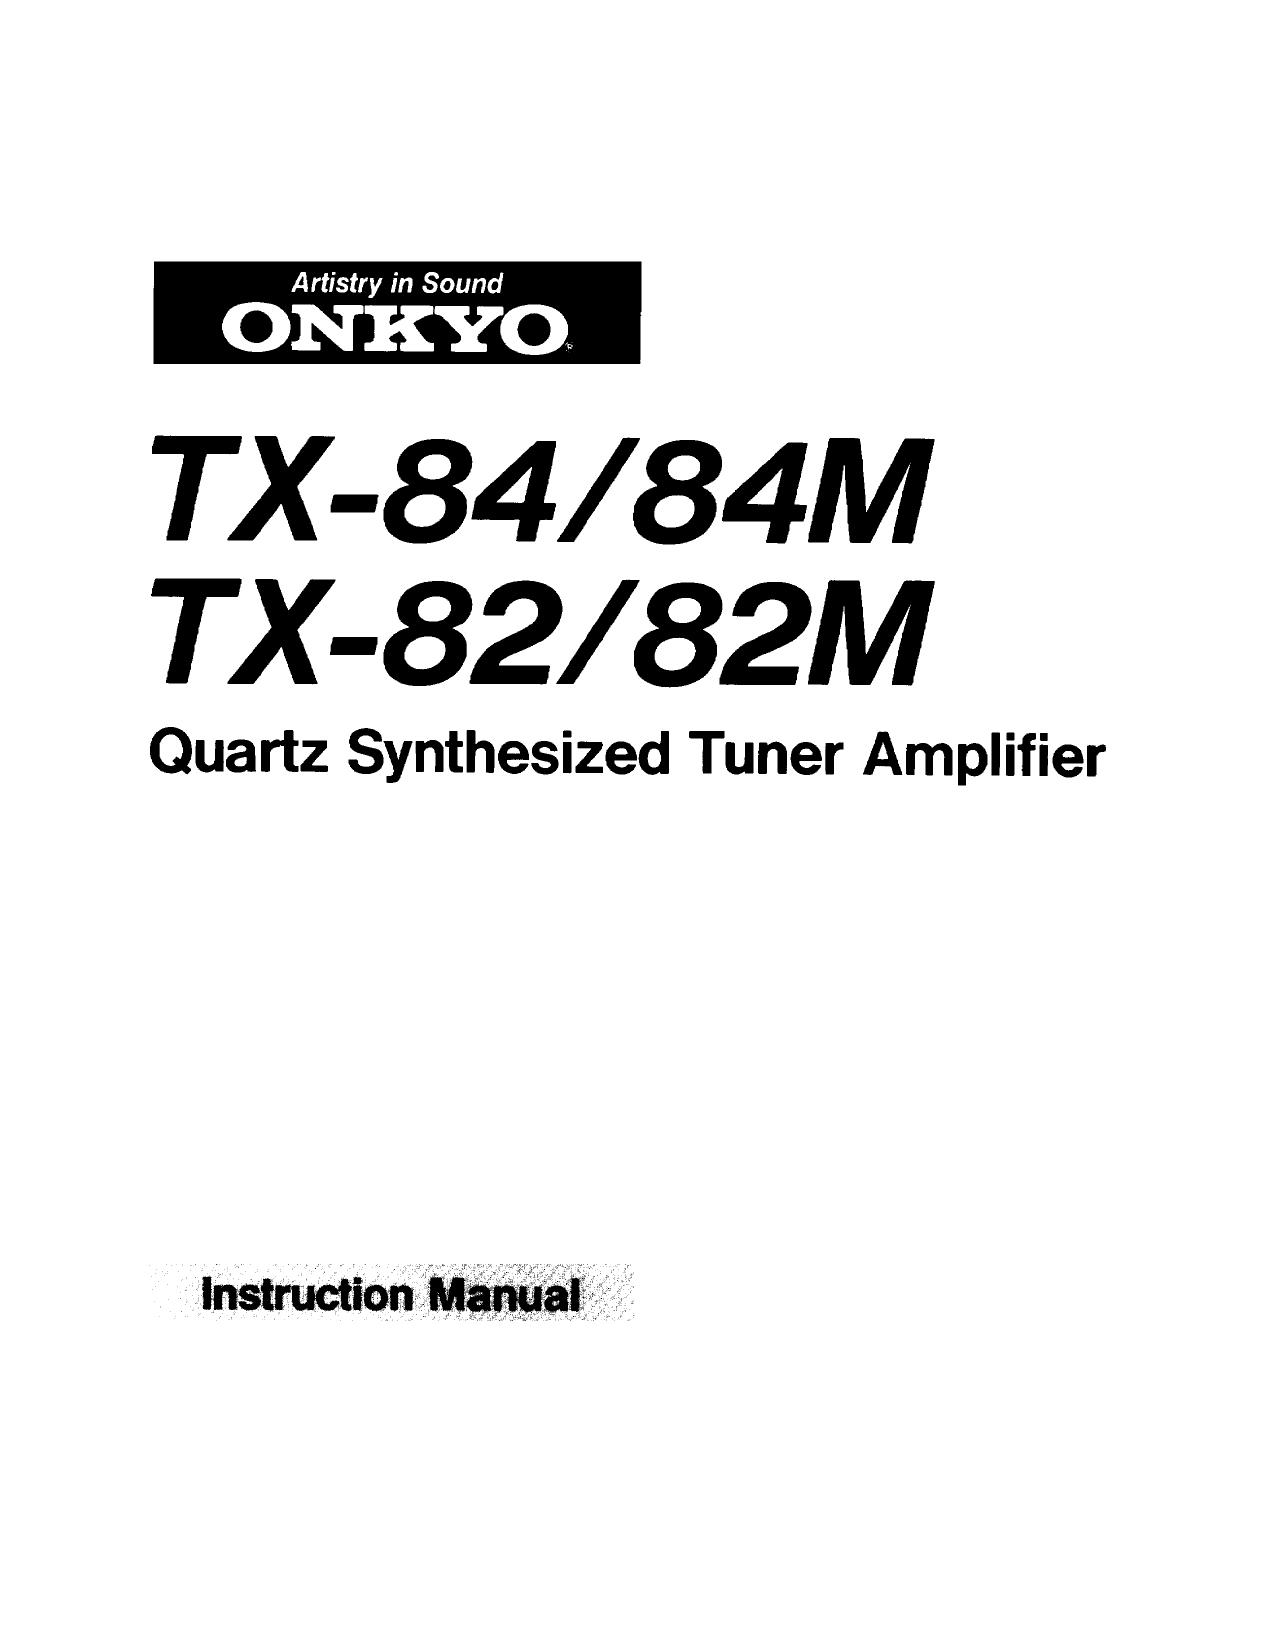 Download free pdf for Onkyo TX-84 Receiver manual